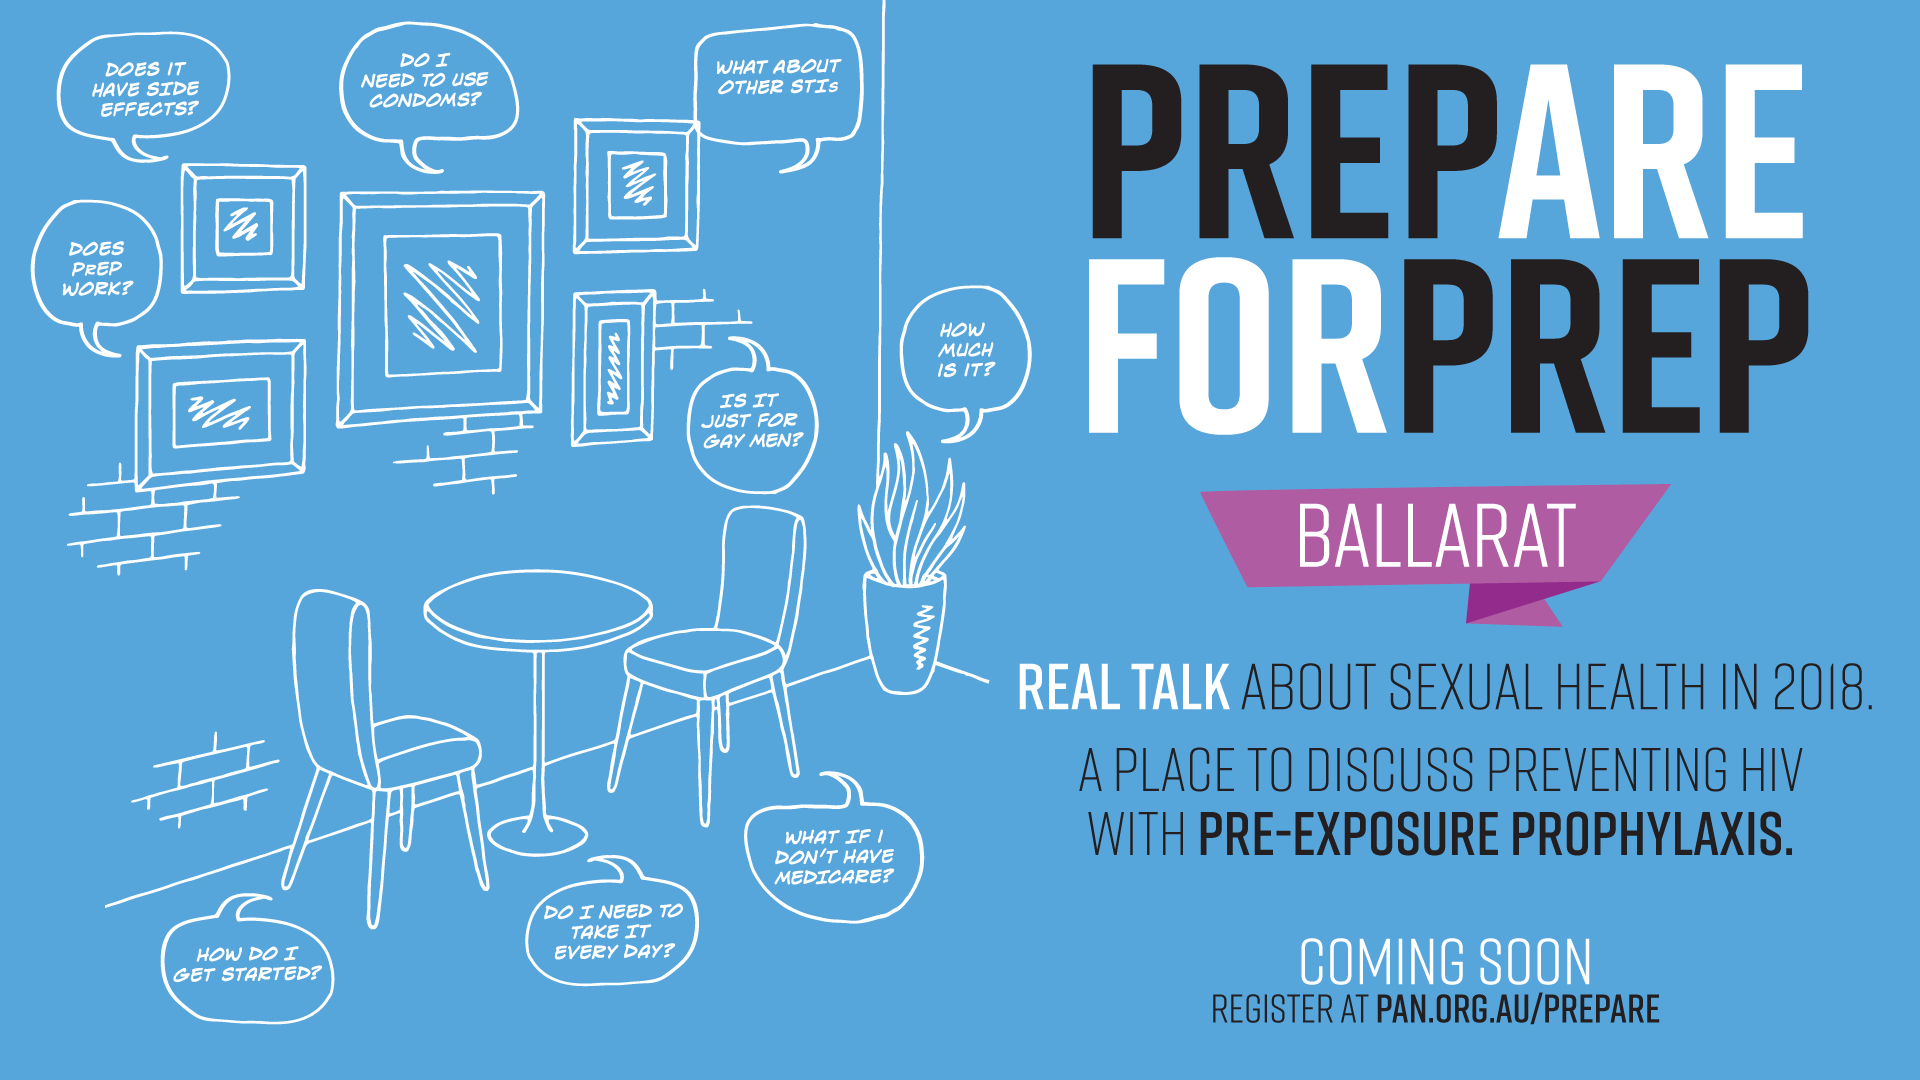 prepareforprep-BALLARAT.png